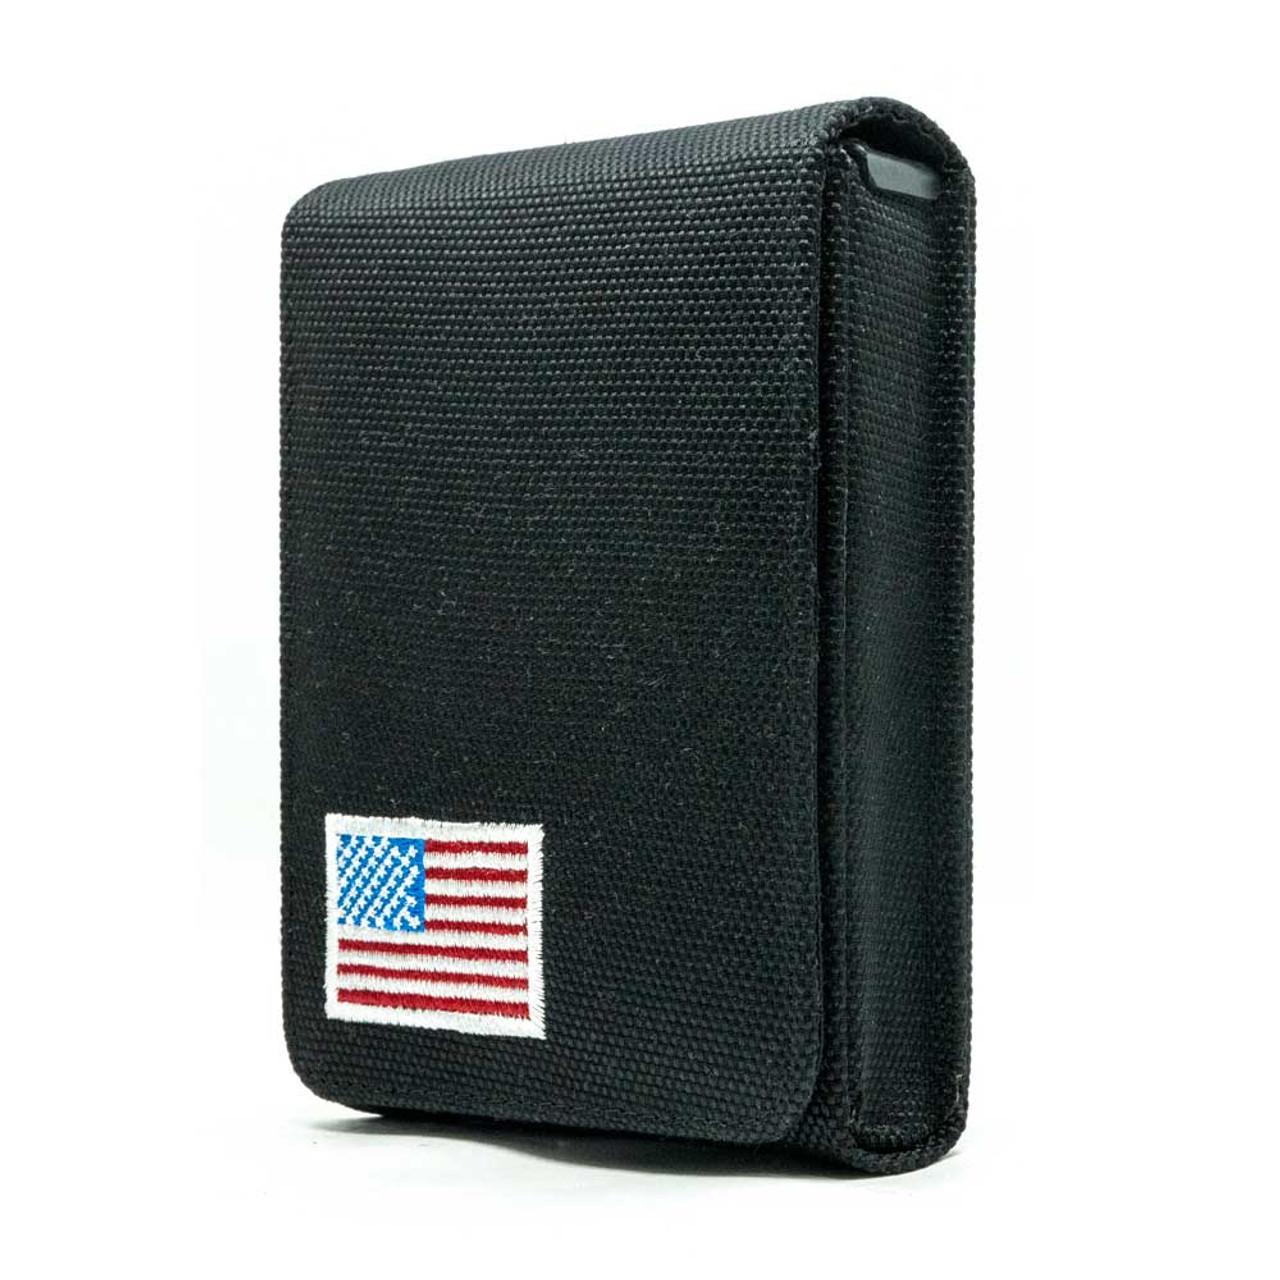 Ruger Security 9 Black Canvas Flag Series Holster